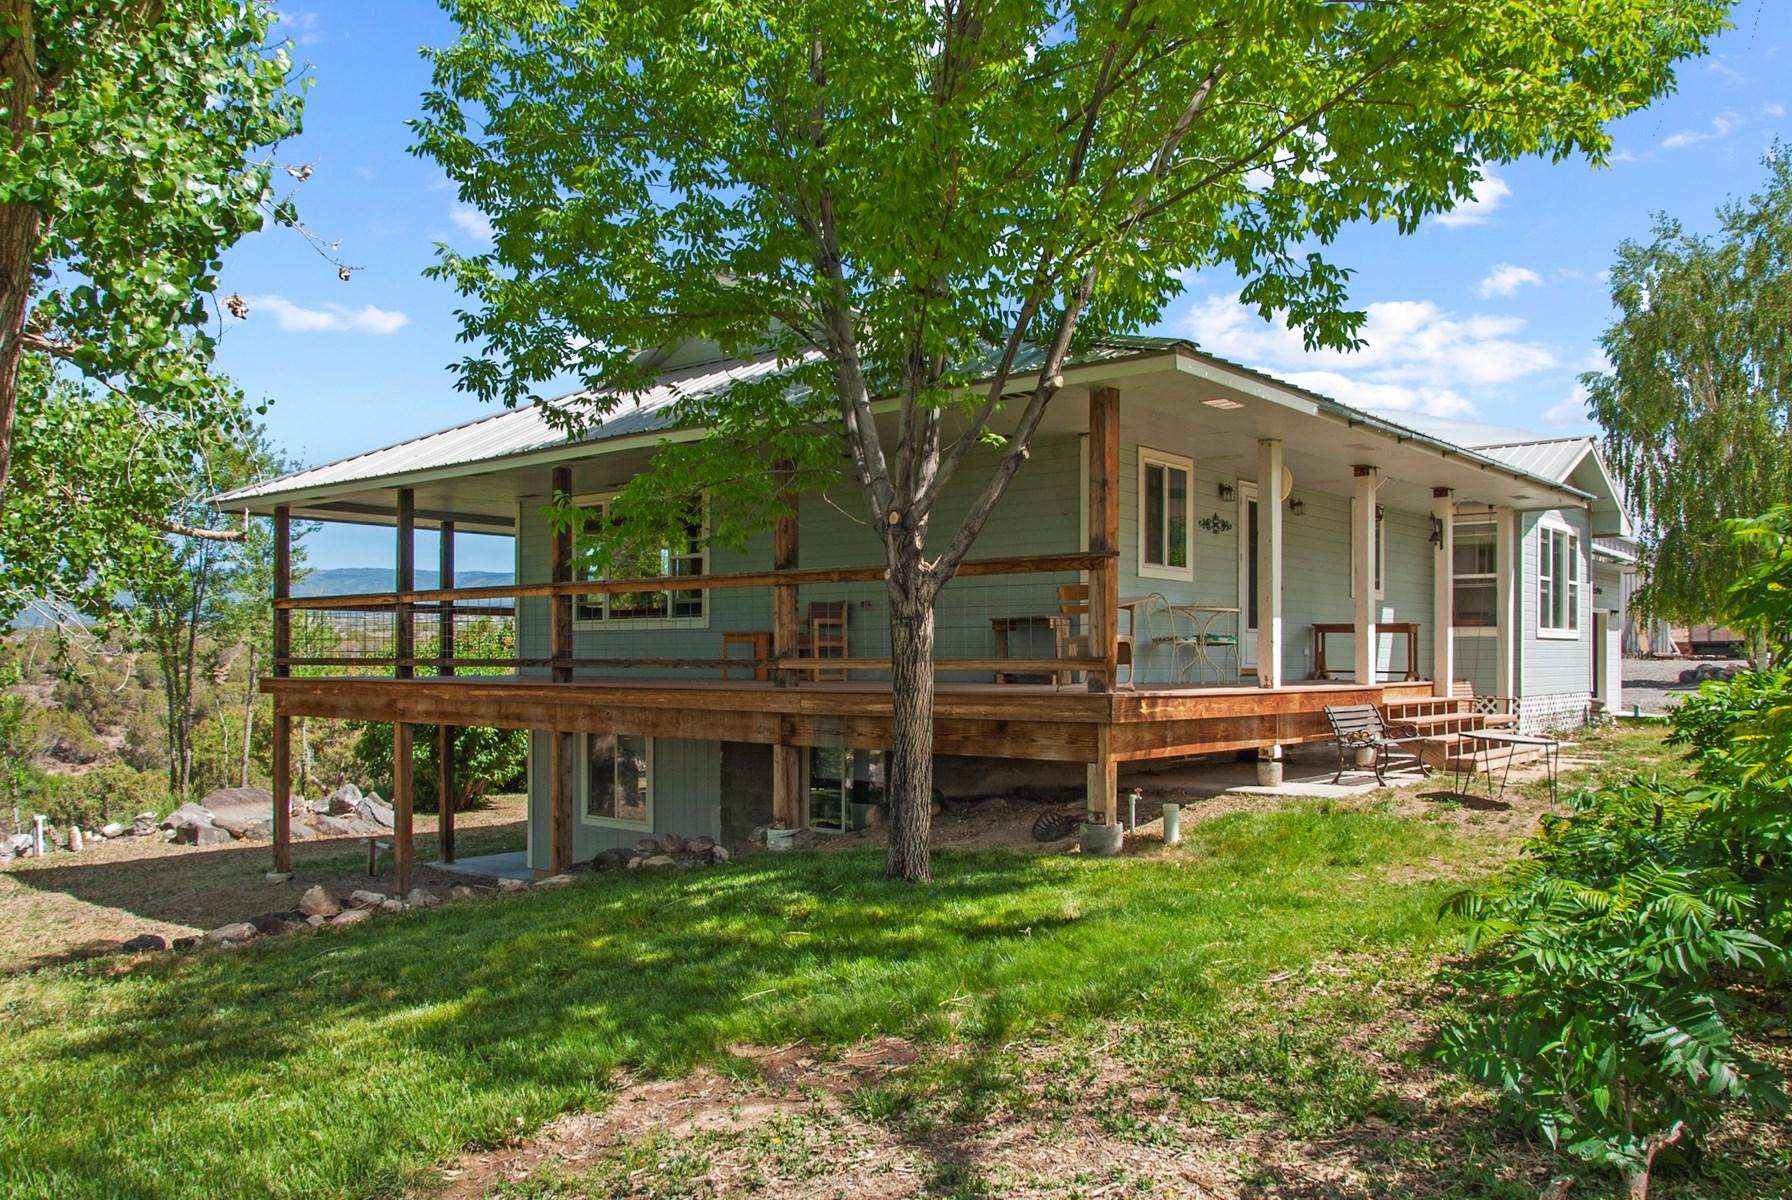 42 +/- acres - Redlands Mesa, Hotchkiss, Co